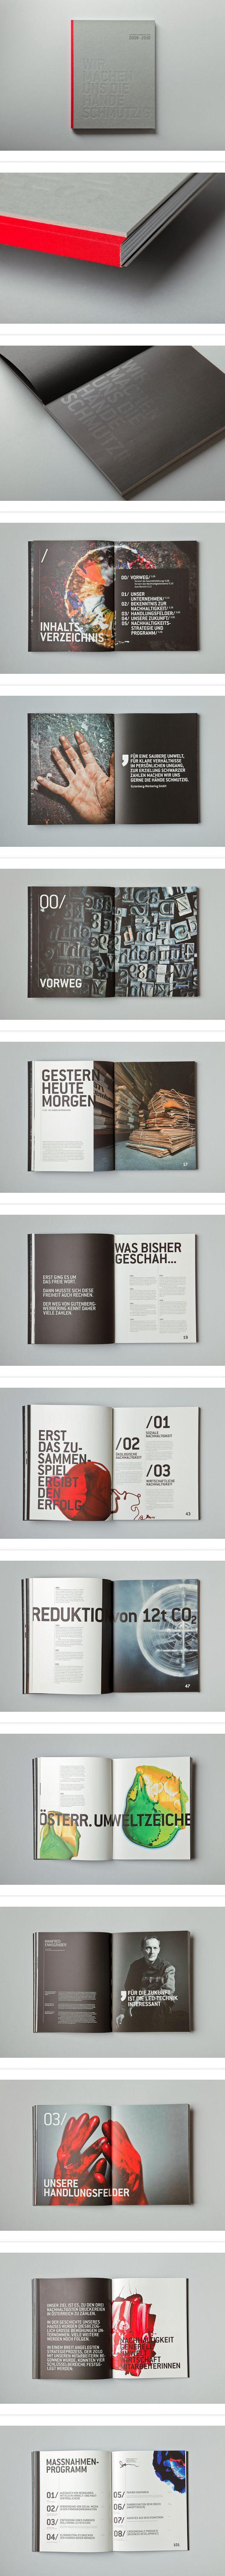 SUSTAINABILITY REPORT by Julian Weidenthaler